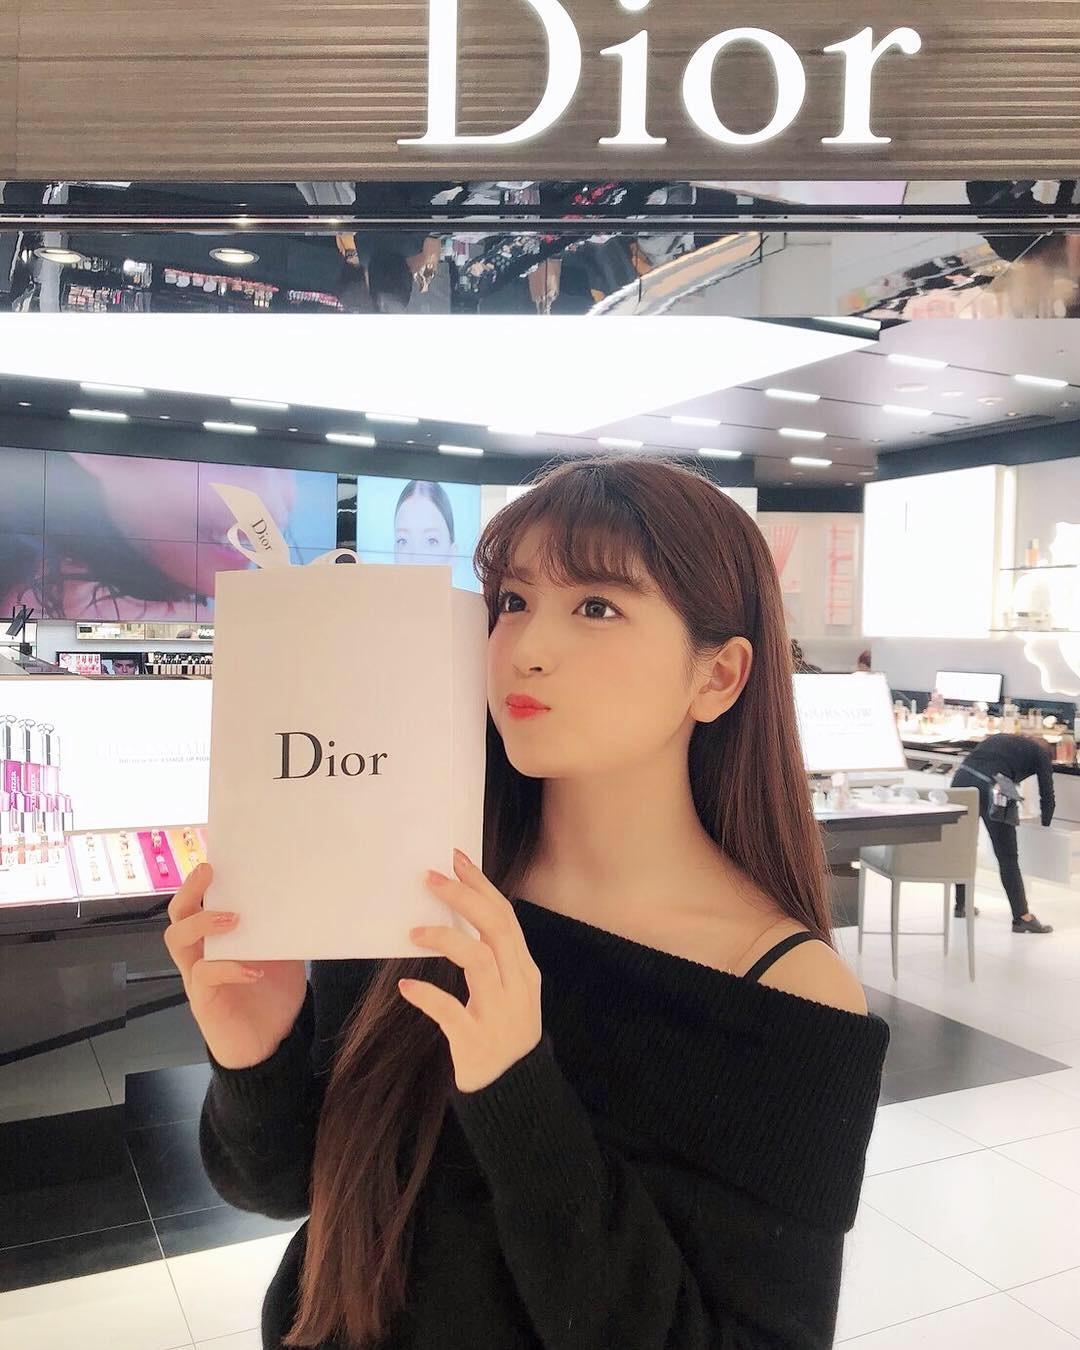 【Dior】大量購入!つるつる肌を作れる最強アイテムも❤︎_1_10